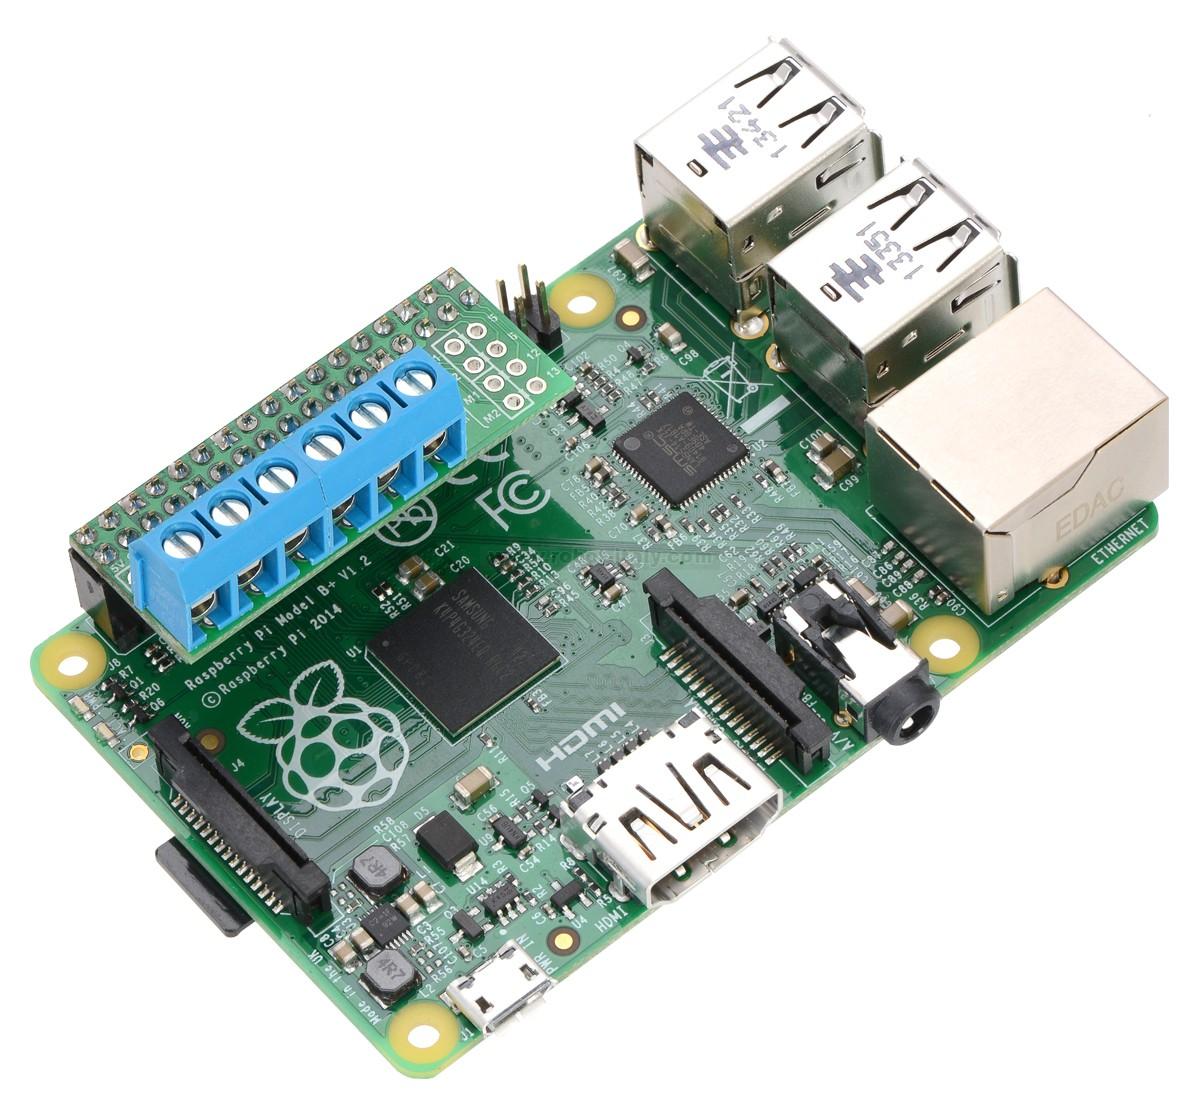 342753 2753 Pololu Drv8835 Dual Motor Driver Kit For Raspberry Pi Drone Wiring Diagram B